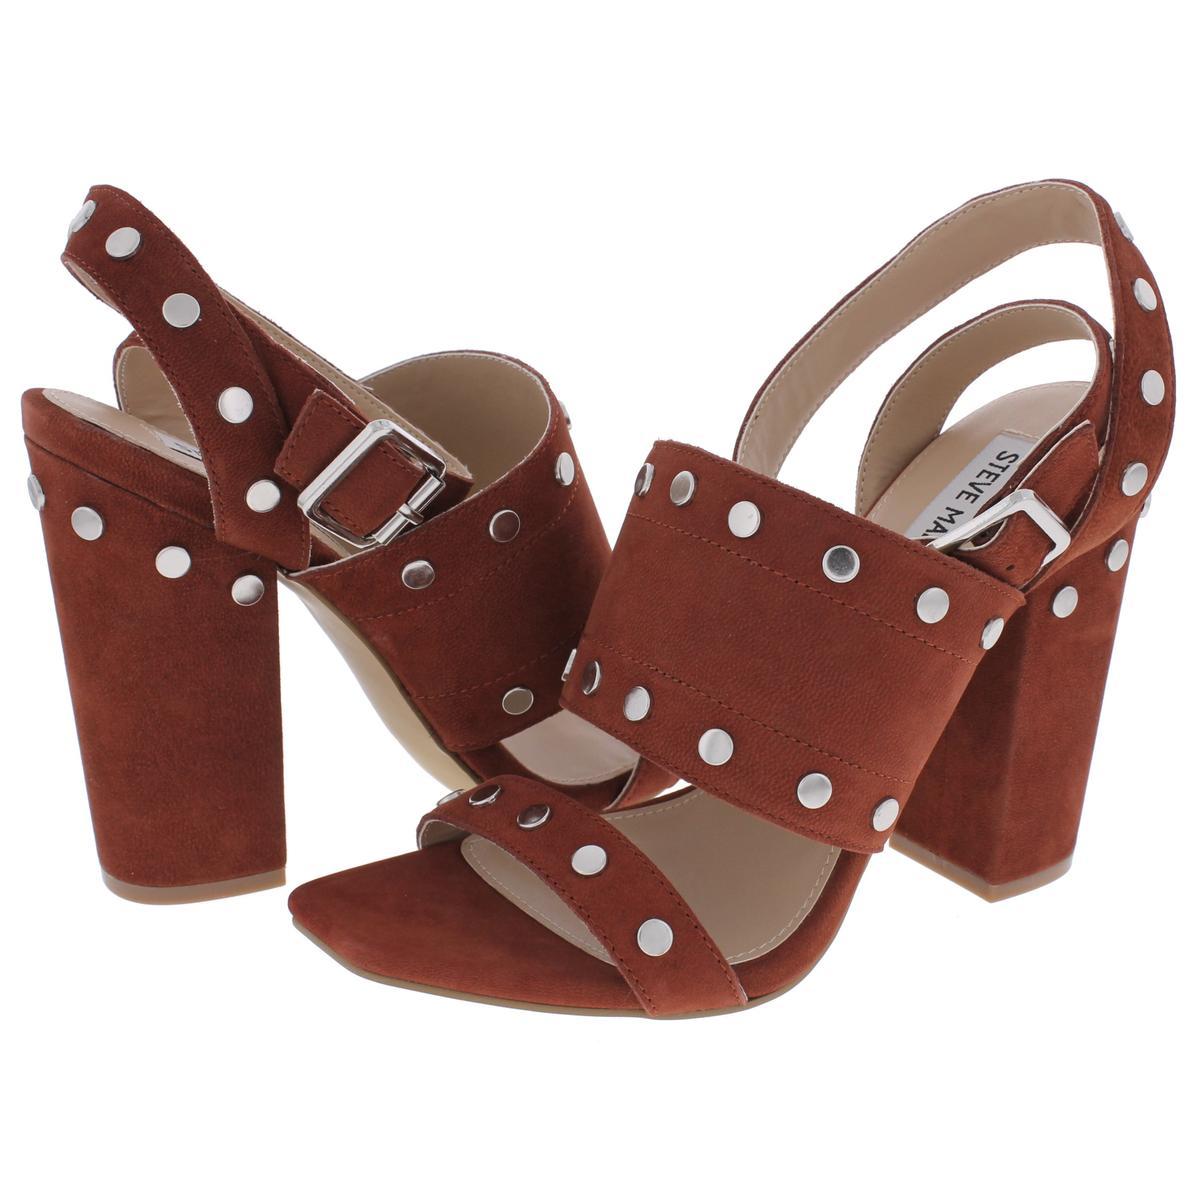 f6b83bd66db Details about Steve Madden Womens Jansen Open Toe Slingback Dress Sandals  Shoes BHFO 2228